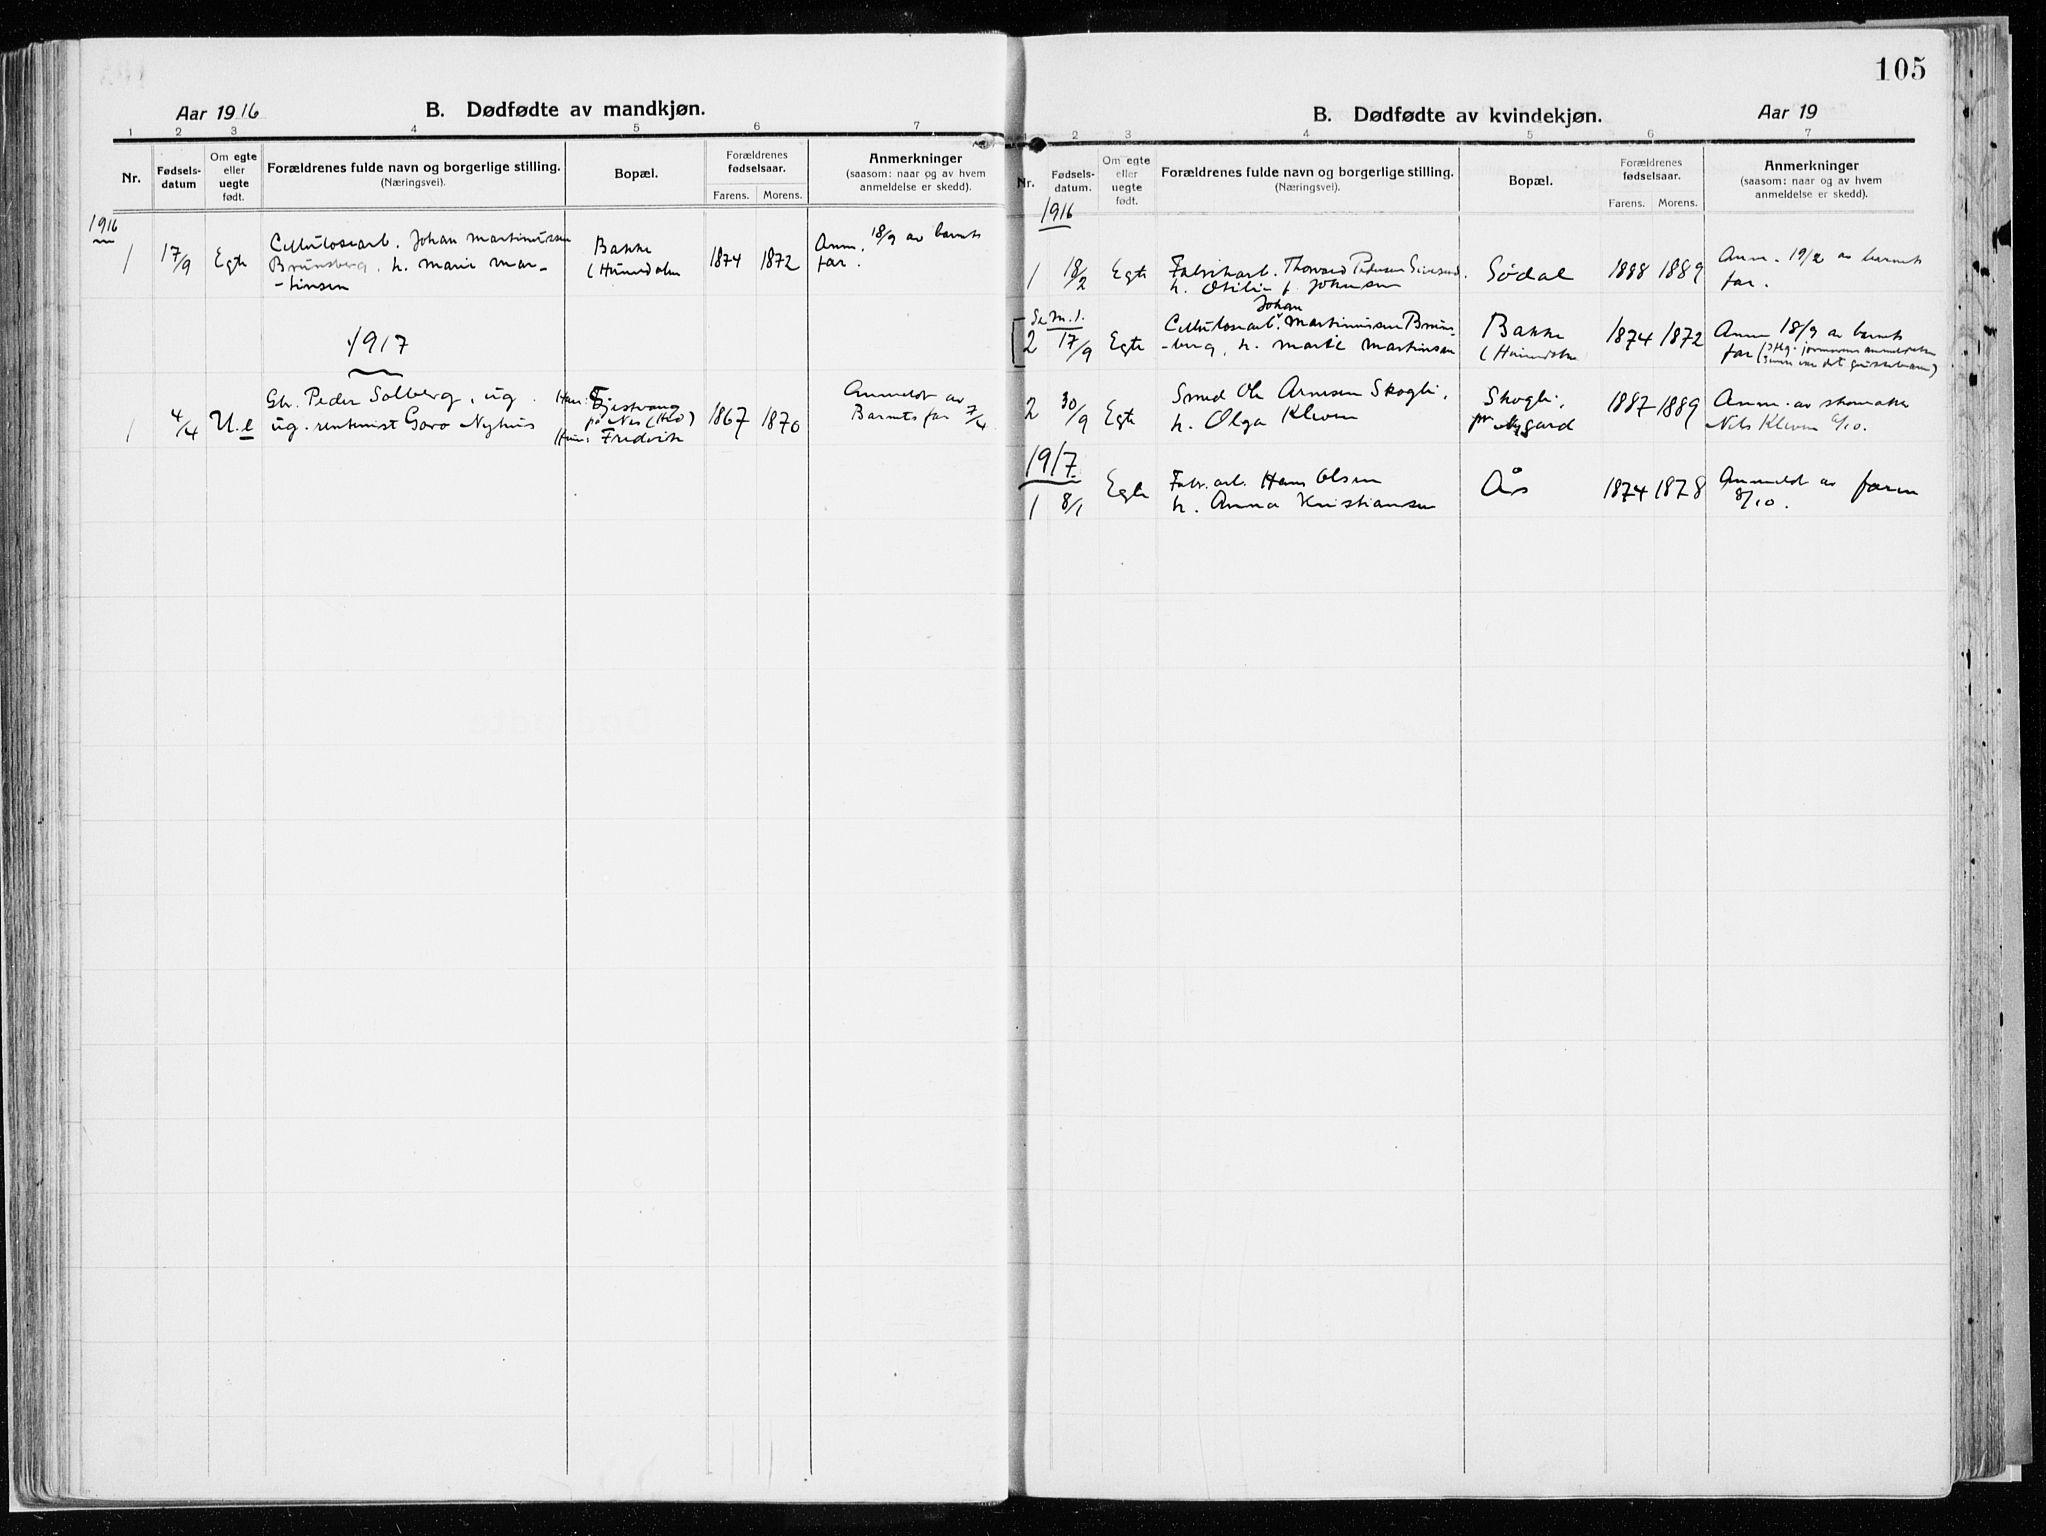 SAH, Vardal prestekontor, H/Ha/Haa/L0017: Ministerialbok nr. 17, 1915-1929, s. 105